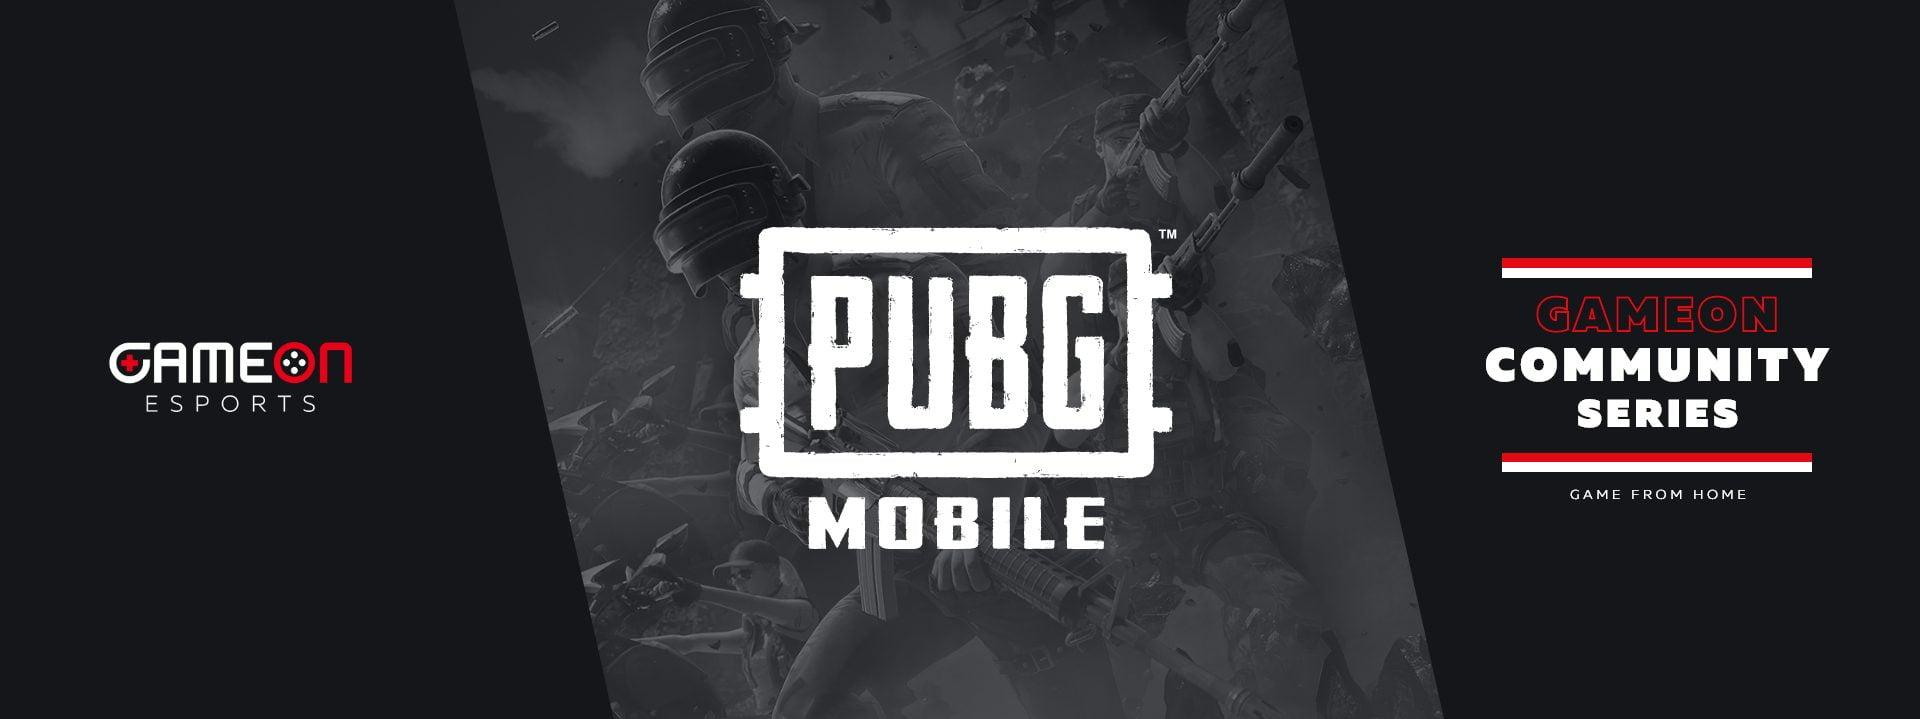 pubg-community-series